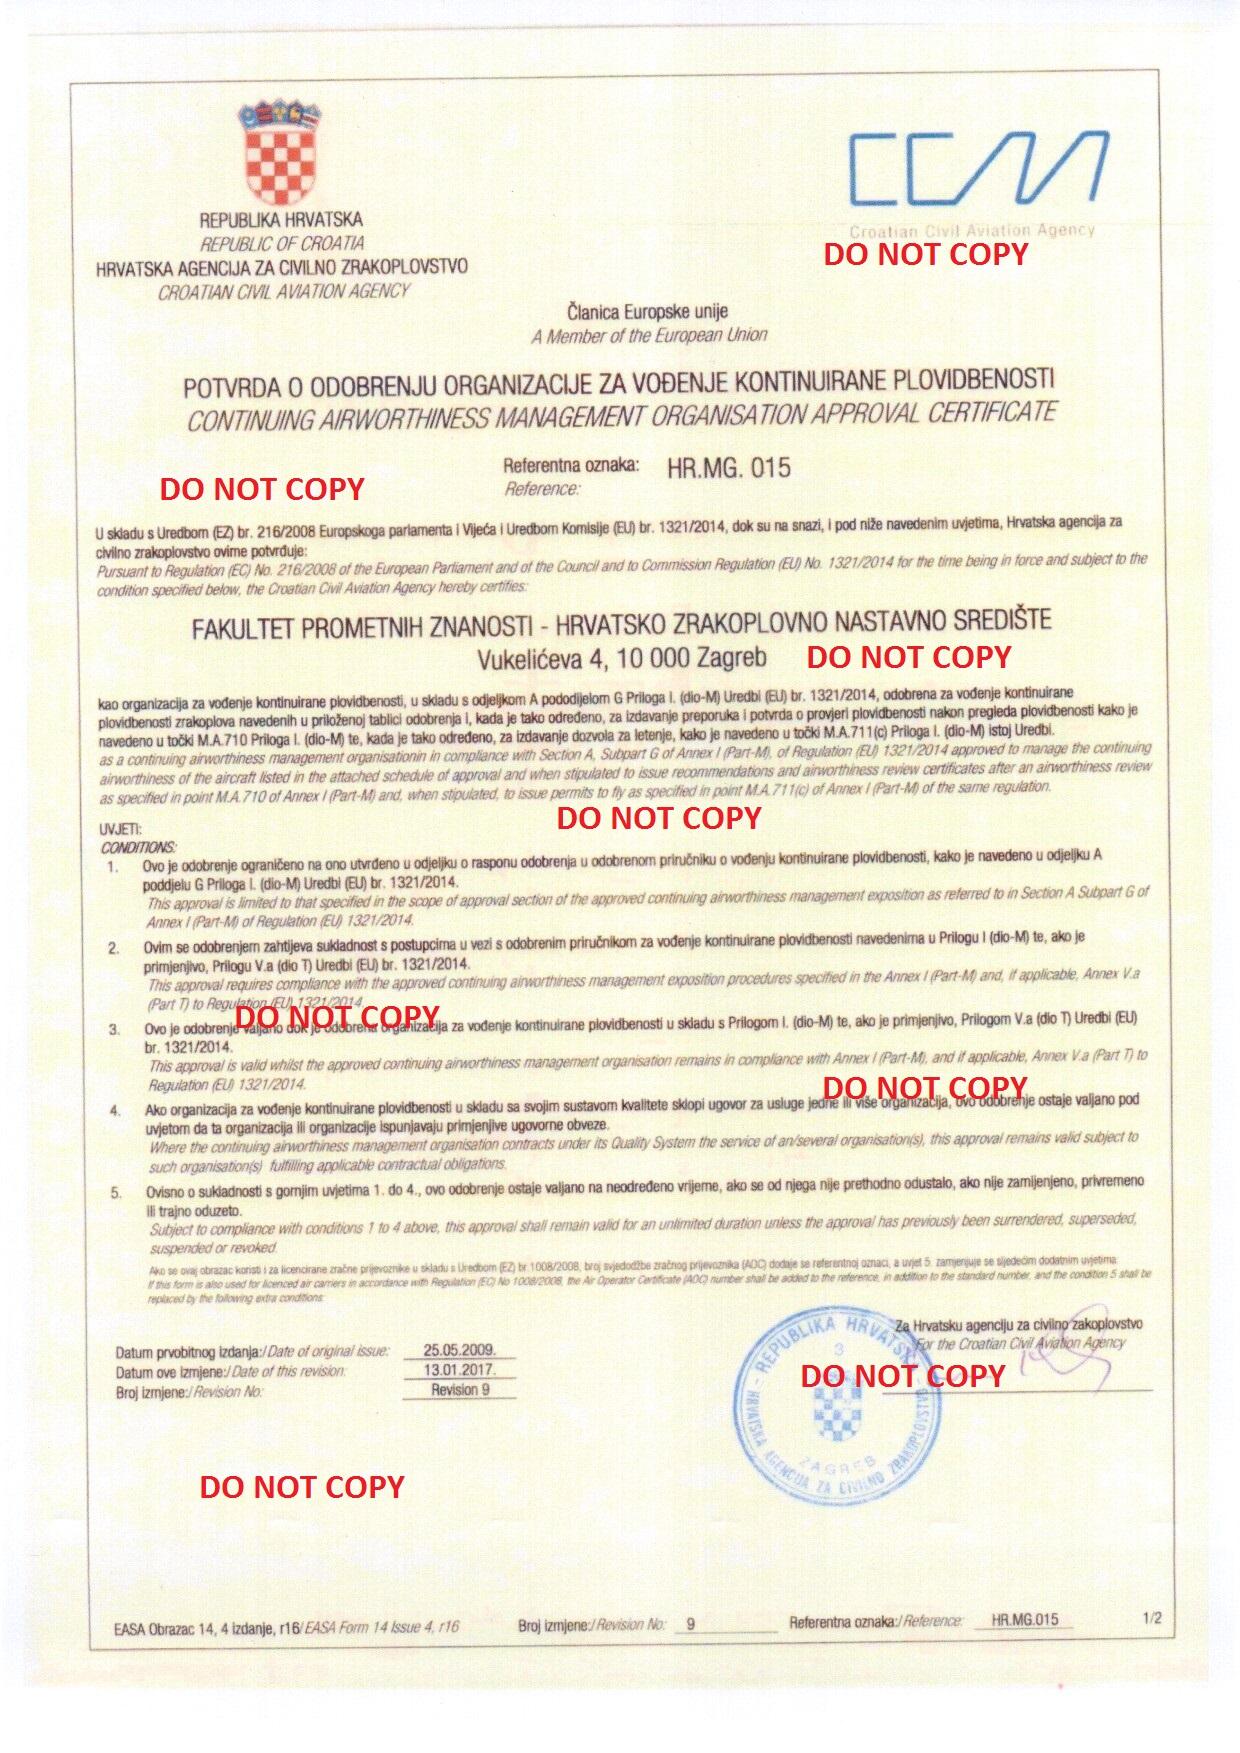 Zavod za aeronautiku hr145015 maintenance organisation approval certificate xflitez Image collections